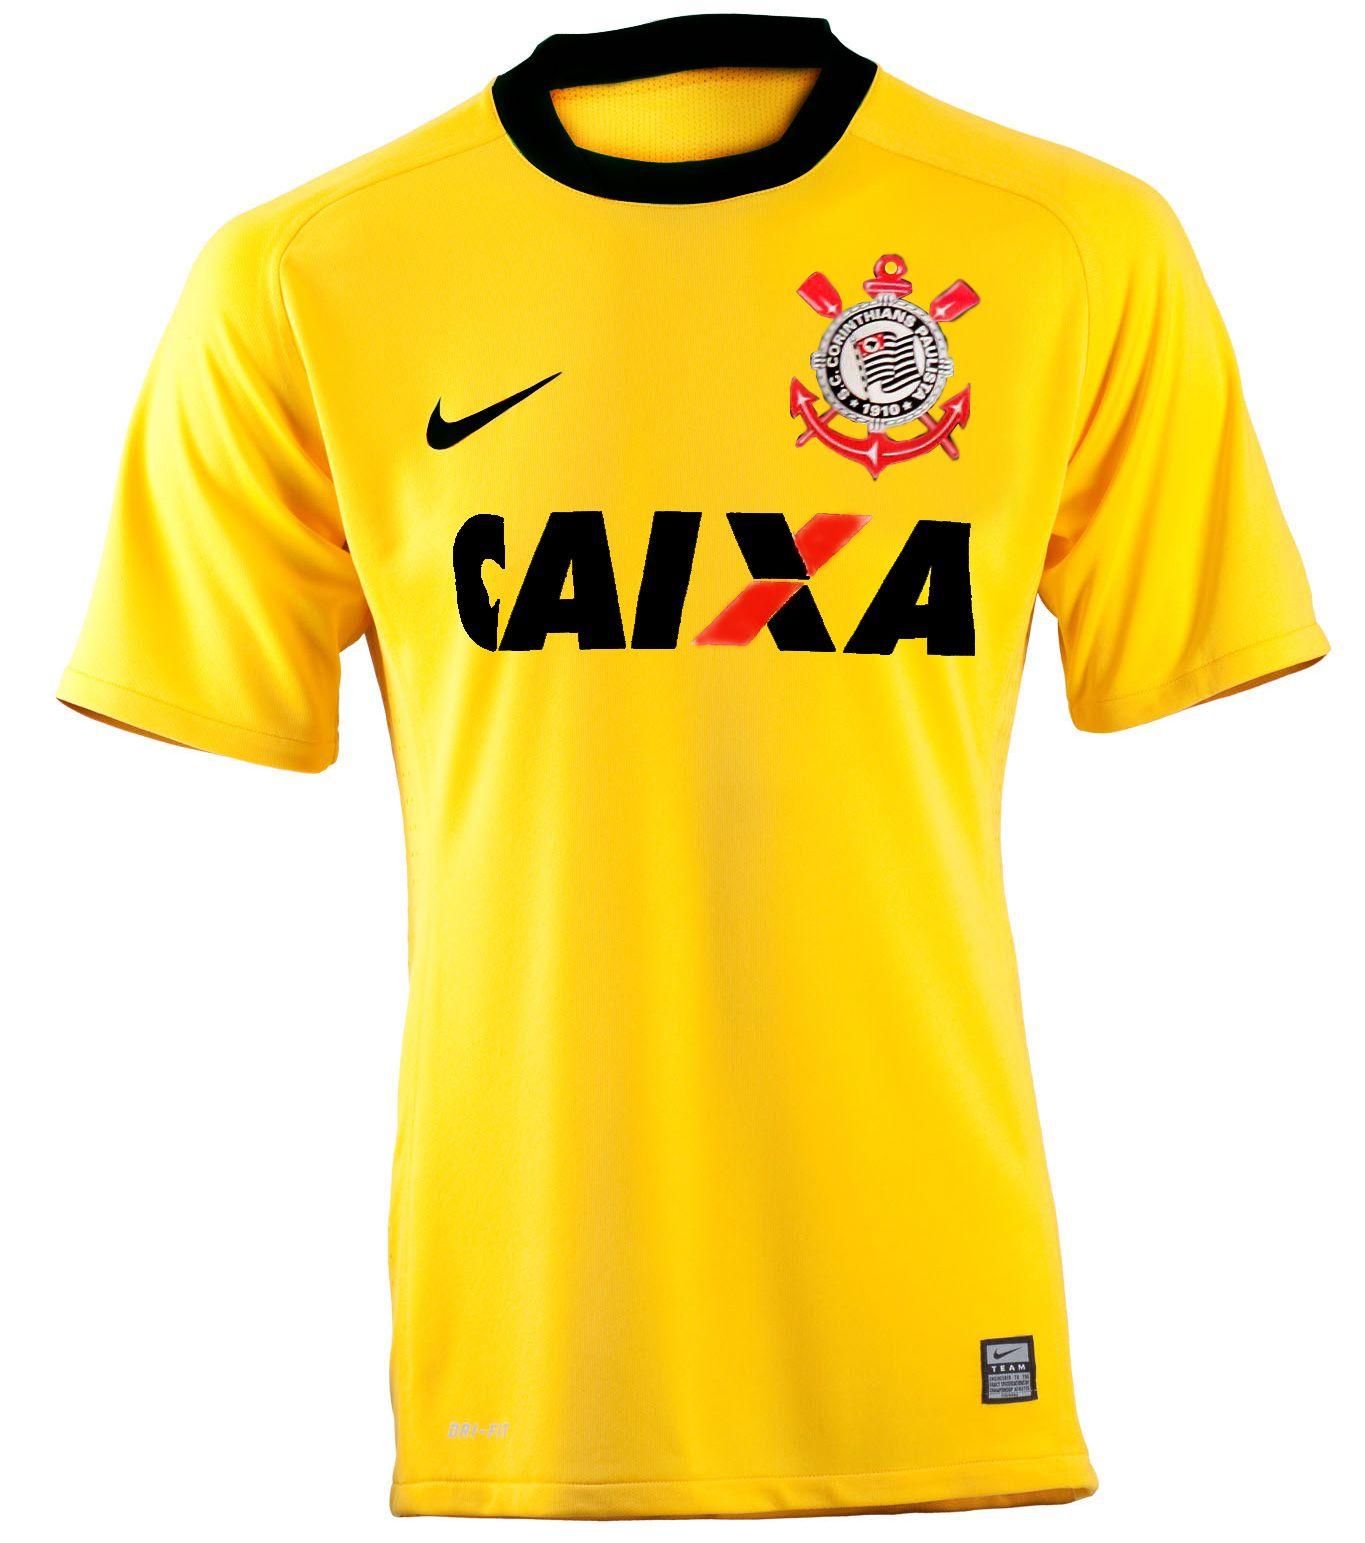 Corinthians terá terceira camisa amarela em 2014 54885475dd6aa